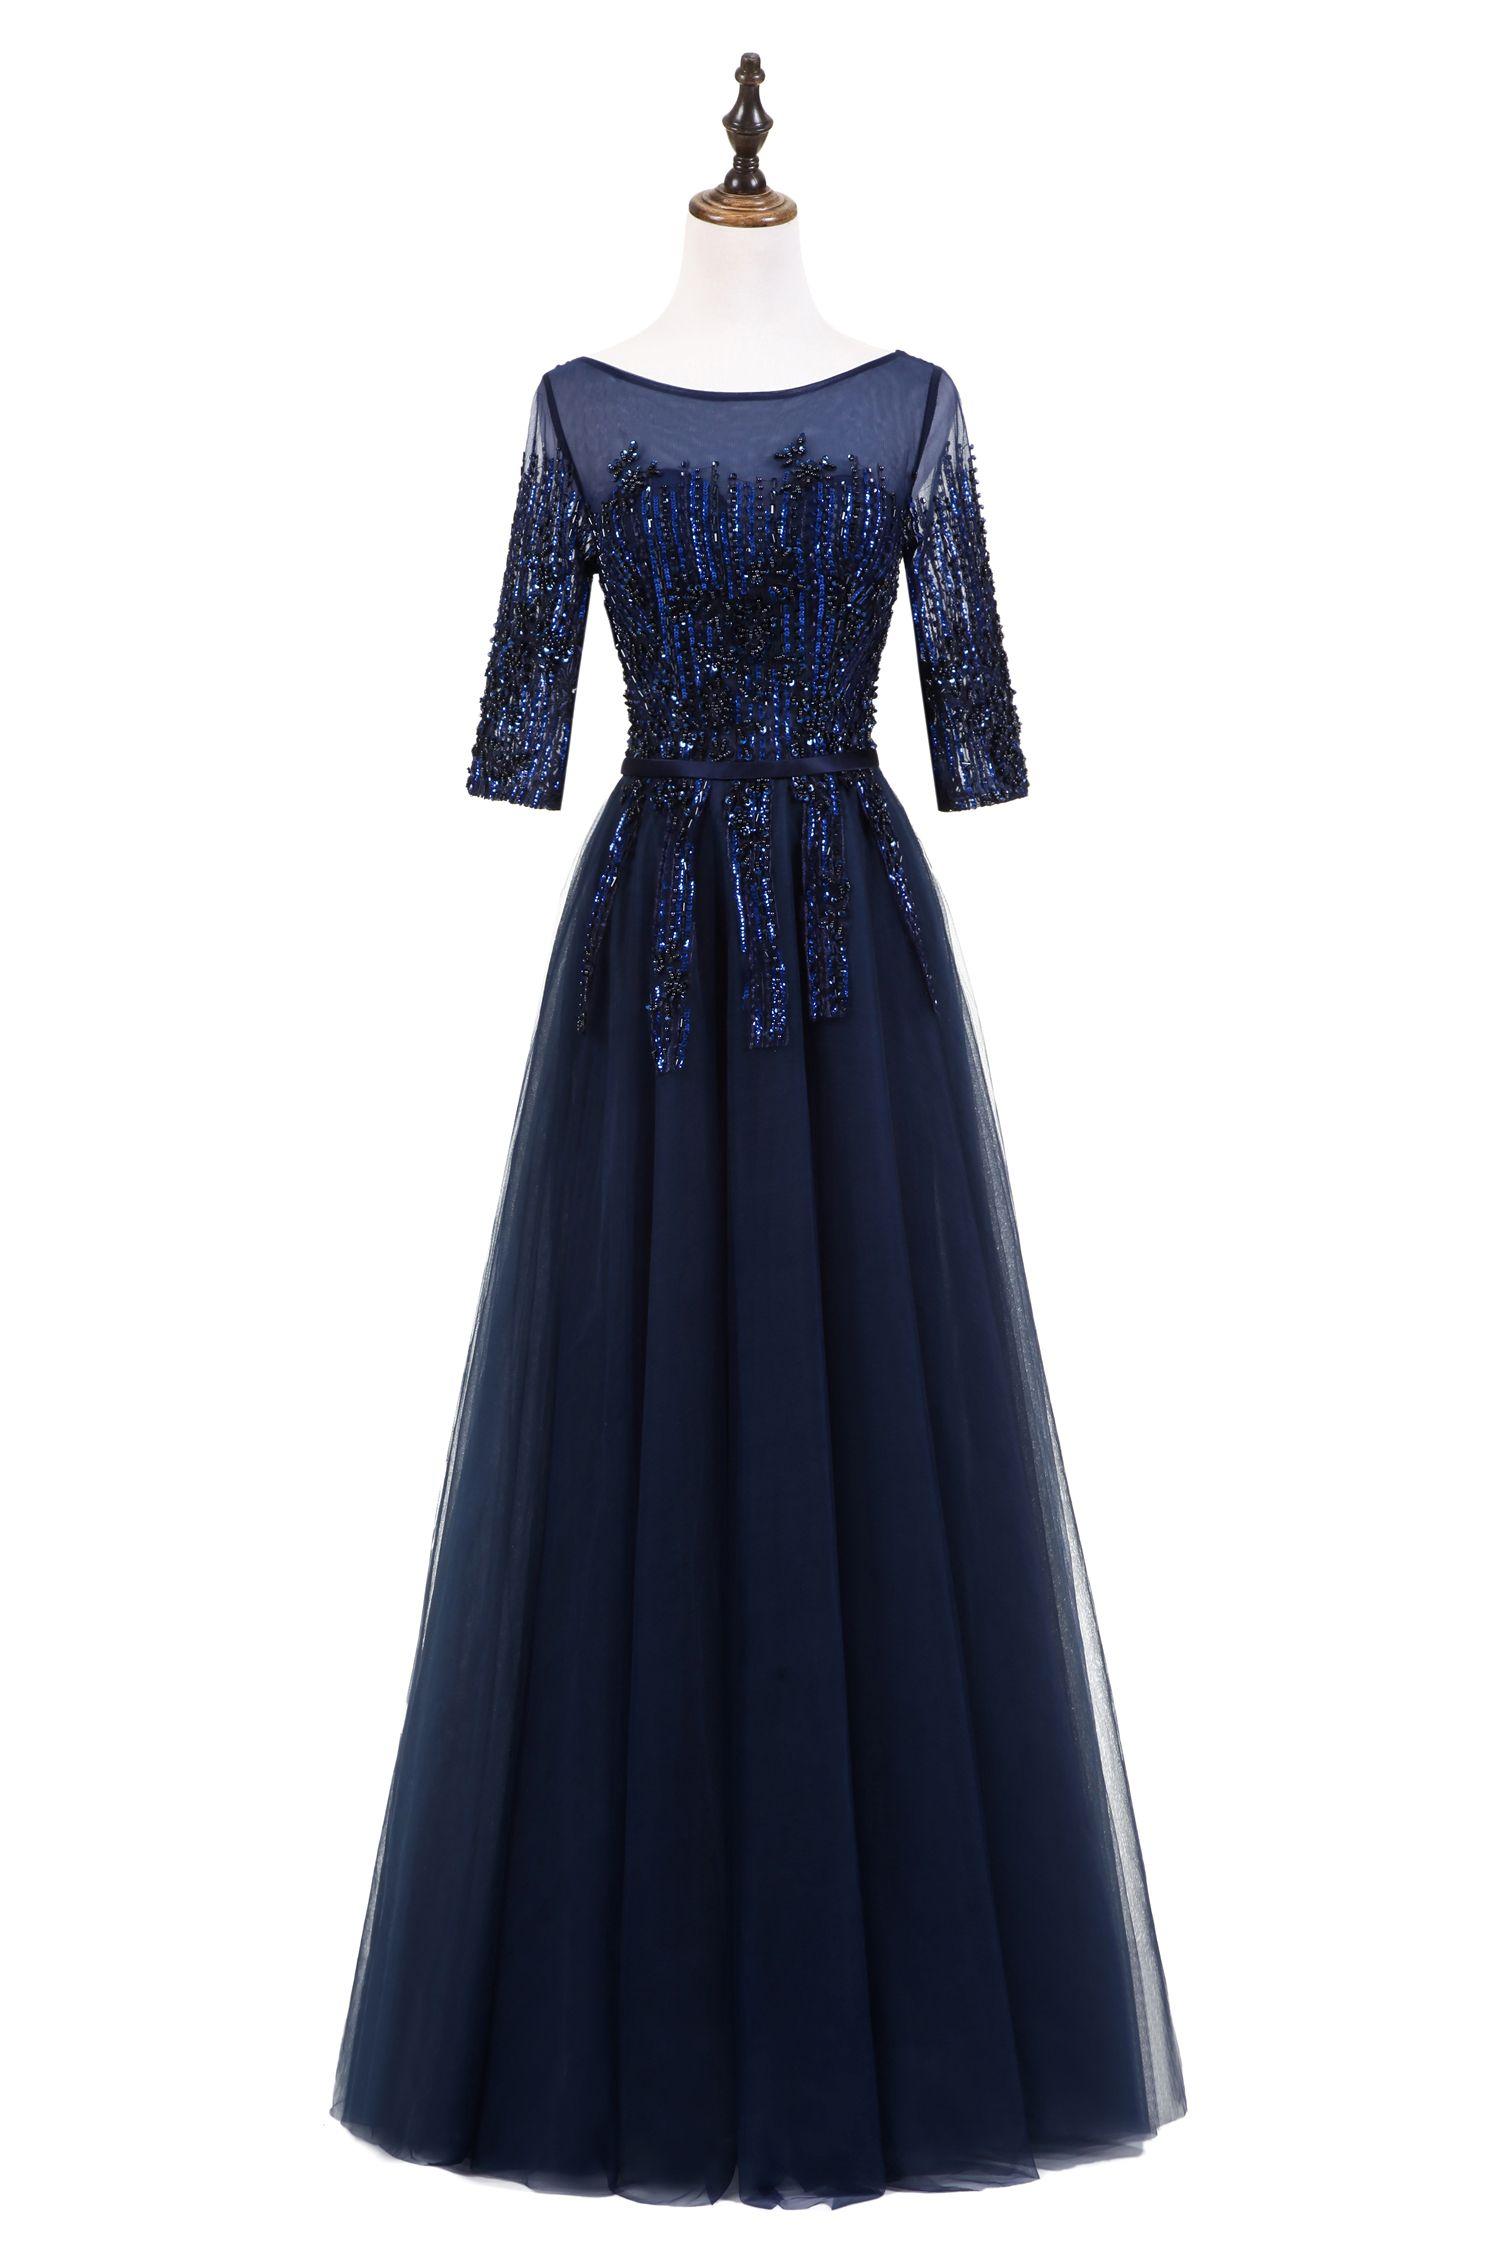 Vintage Prom Dress Long Sleeve Evening Dresses Robe De Soiree Formal Dress Vestido Longo De Festa E007